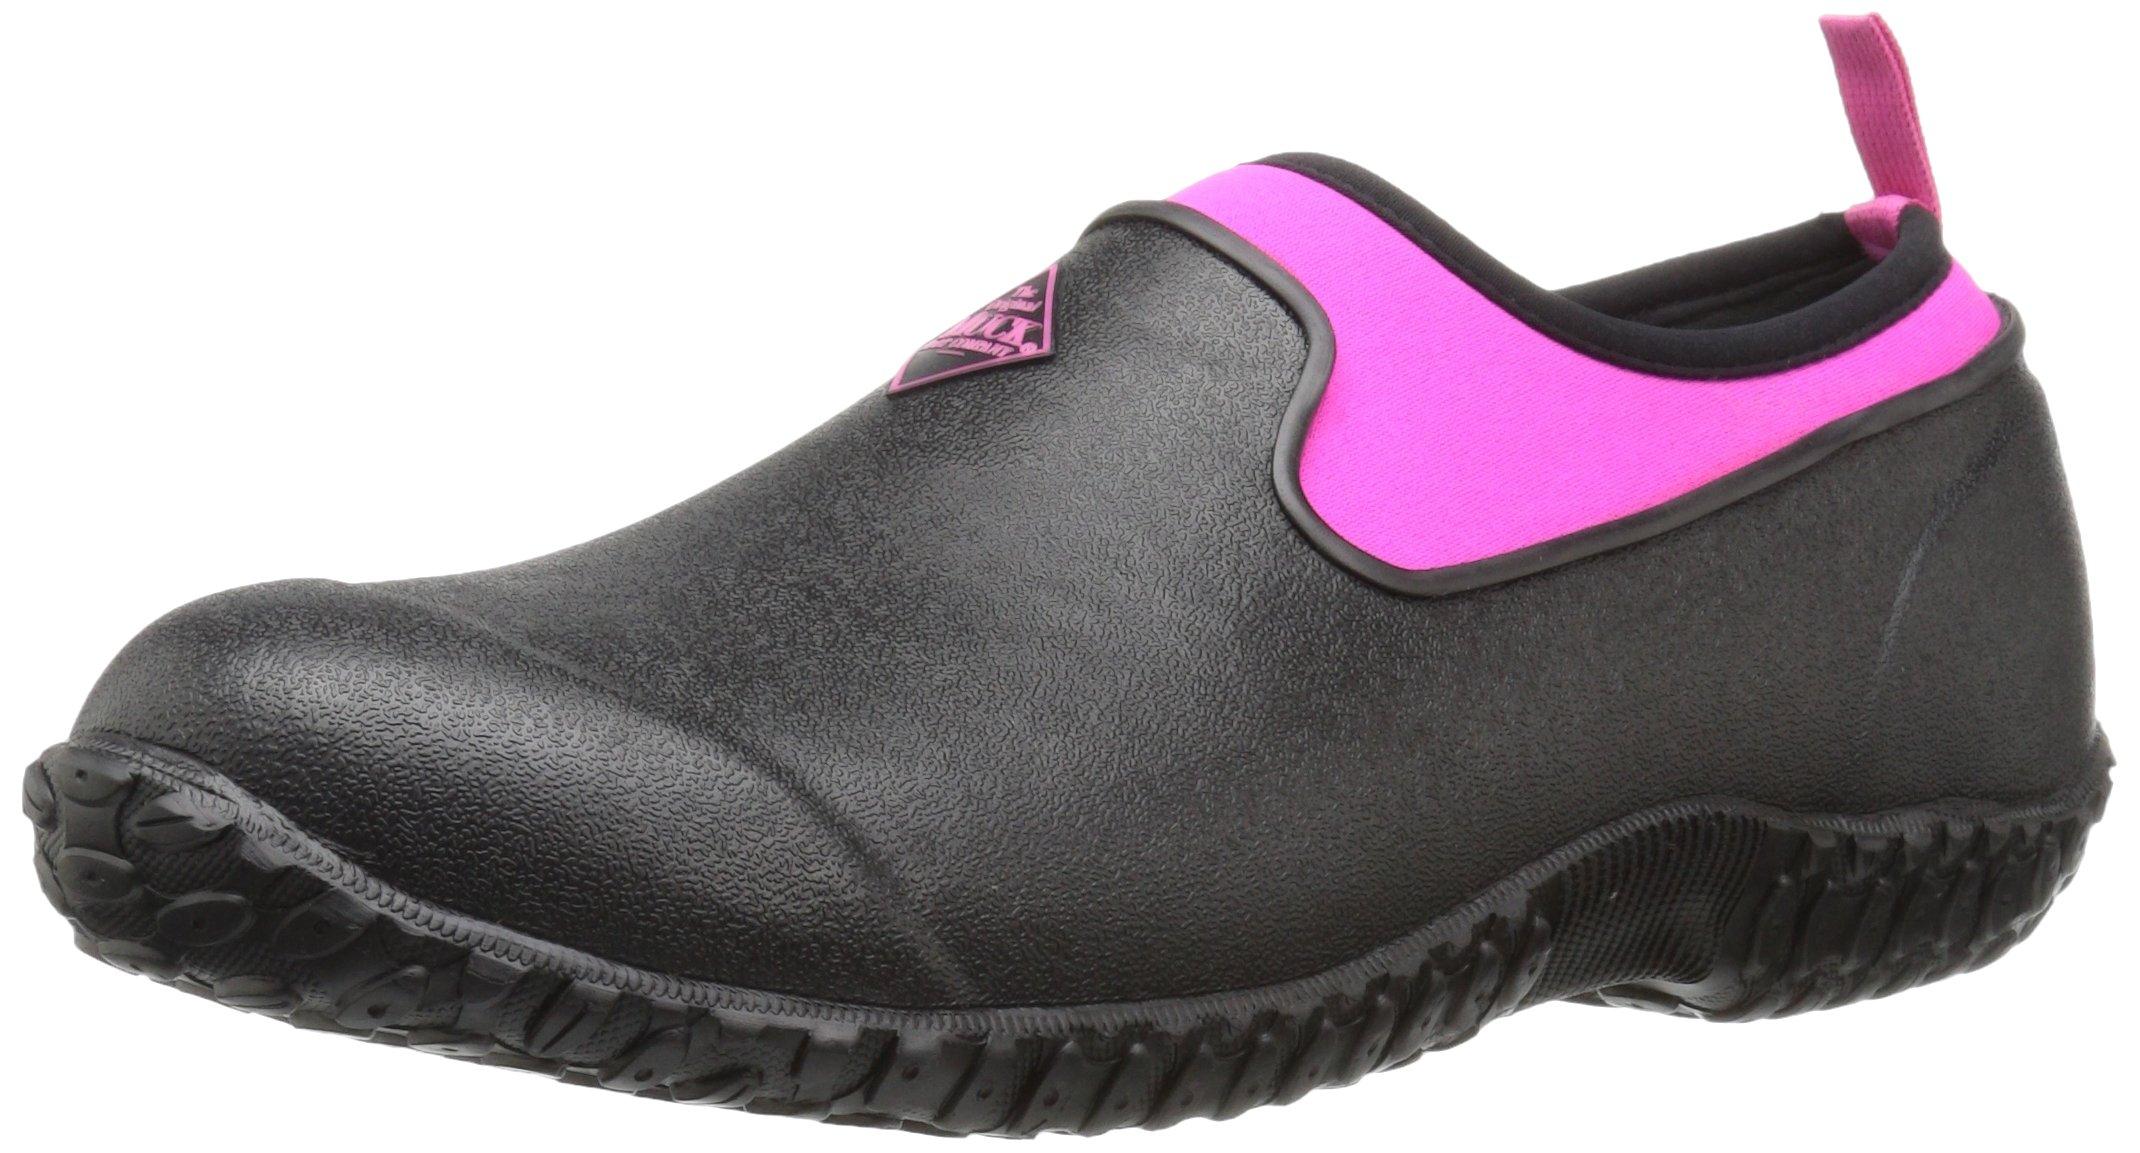 Ii LowBottesamp; Muck Women's Pink37 Bottines FemmeNoirblack Muckster hot Pluie Boots Eu De ZuTwPkXilO